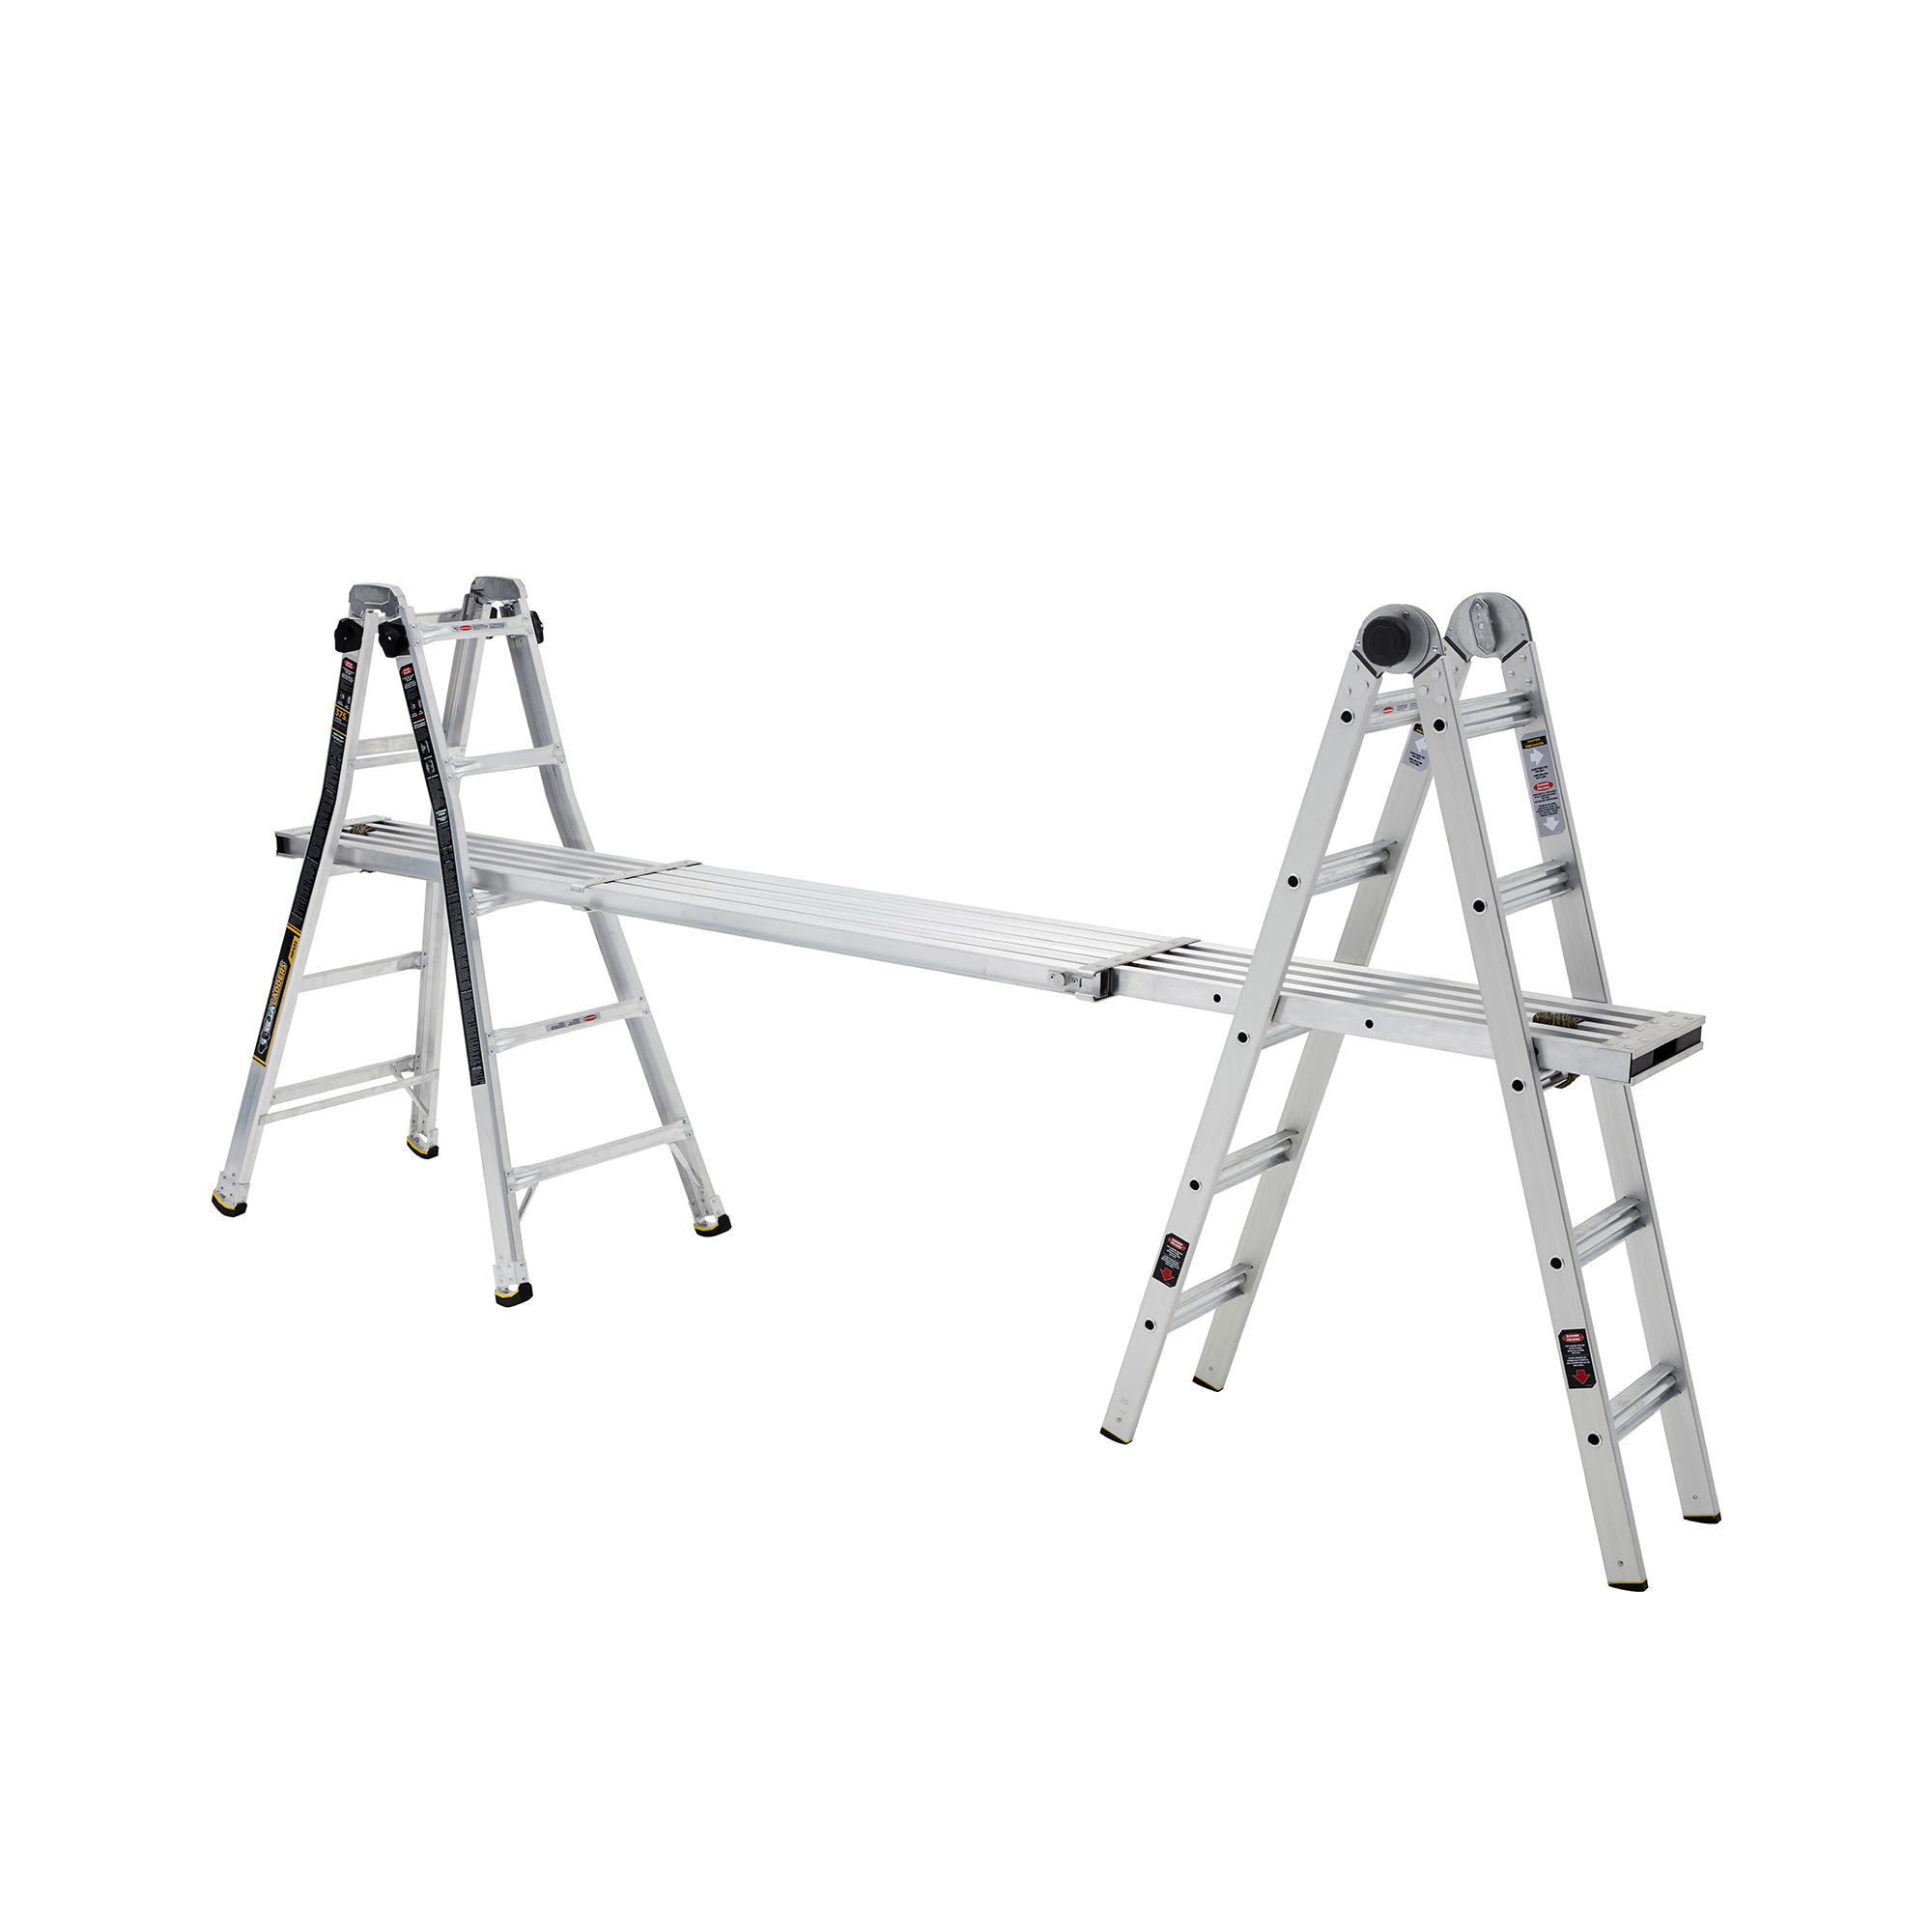 Gorilla LaddersGLMPX-22 / GLA-MPX22 - Gorilla Ladders